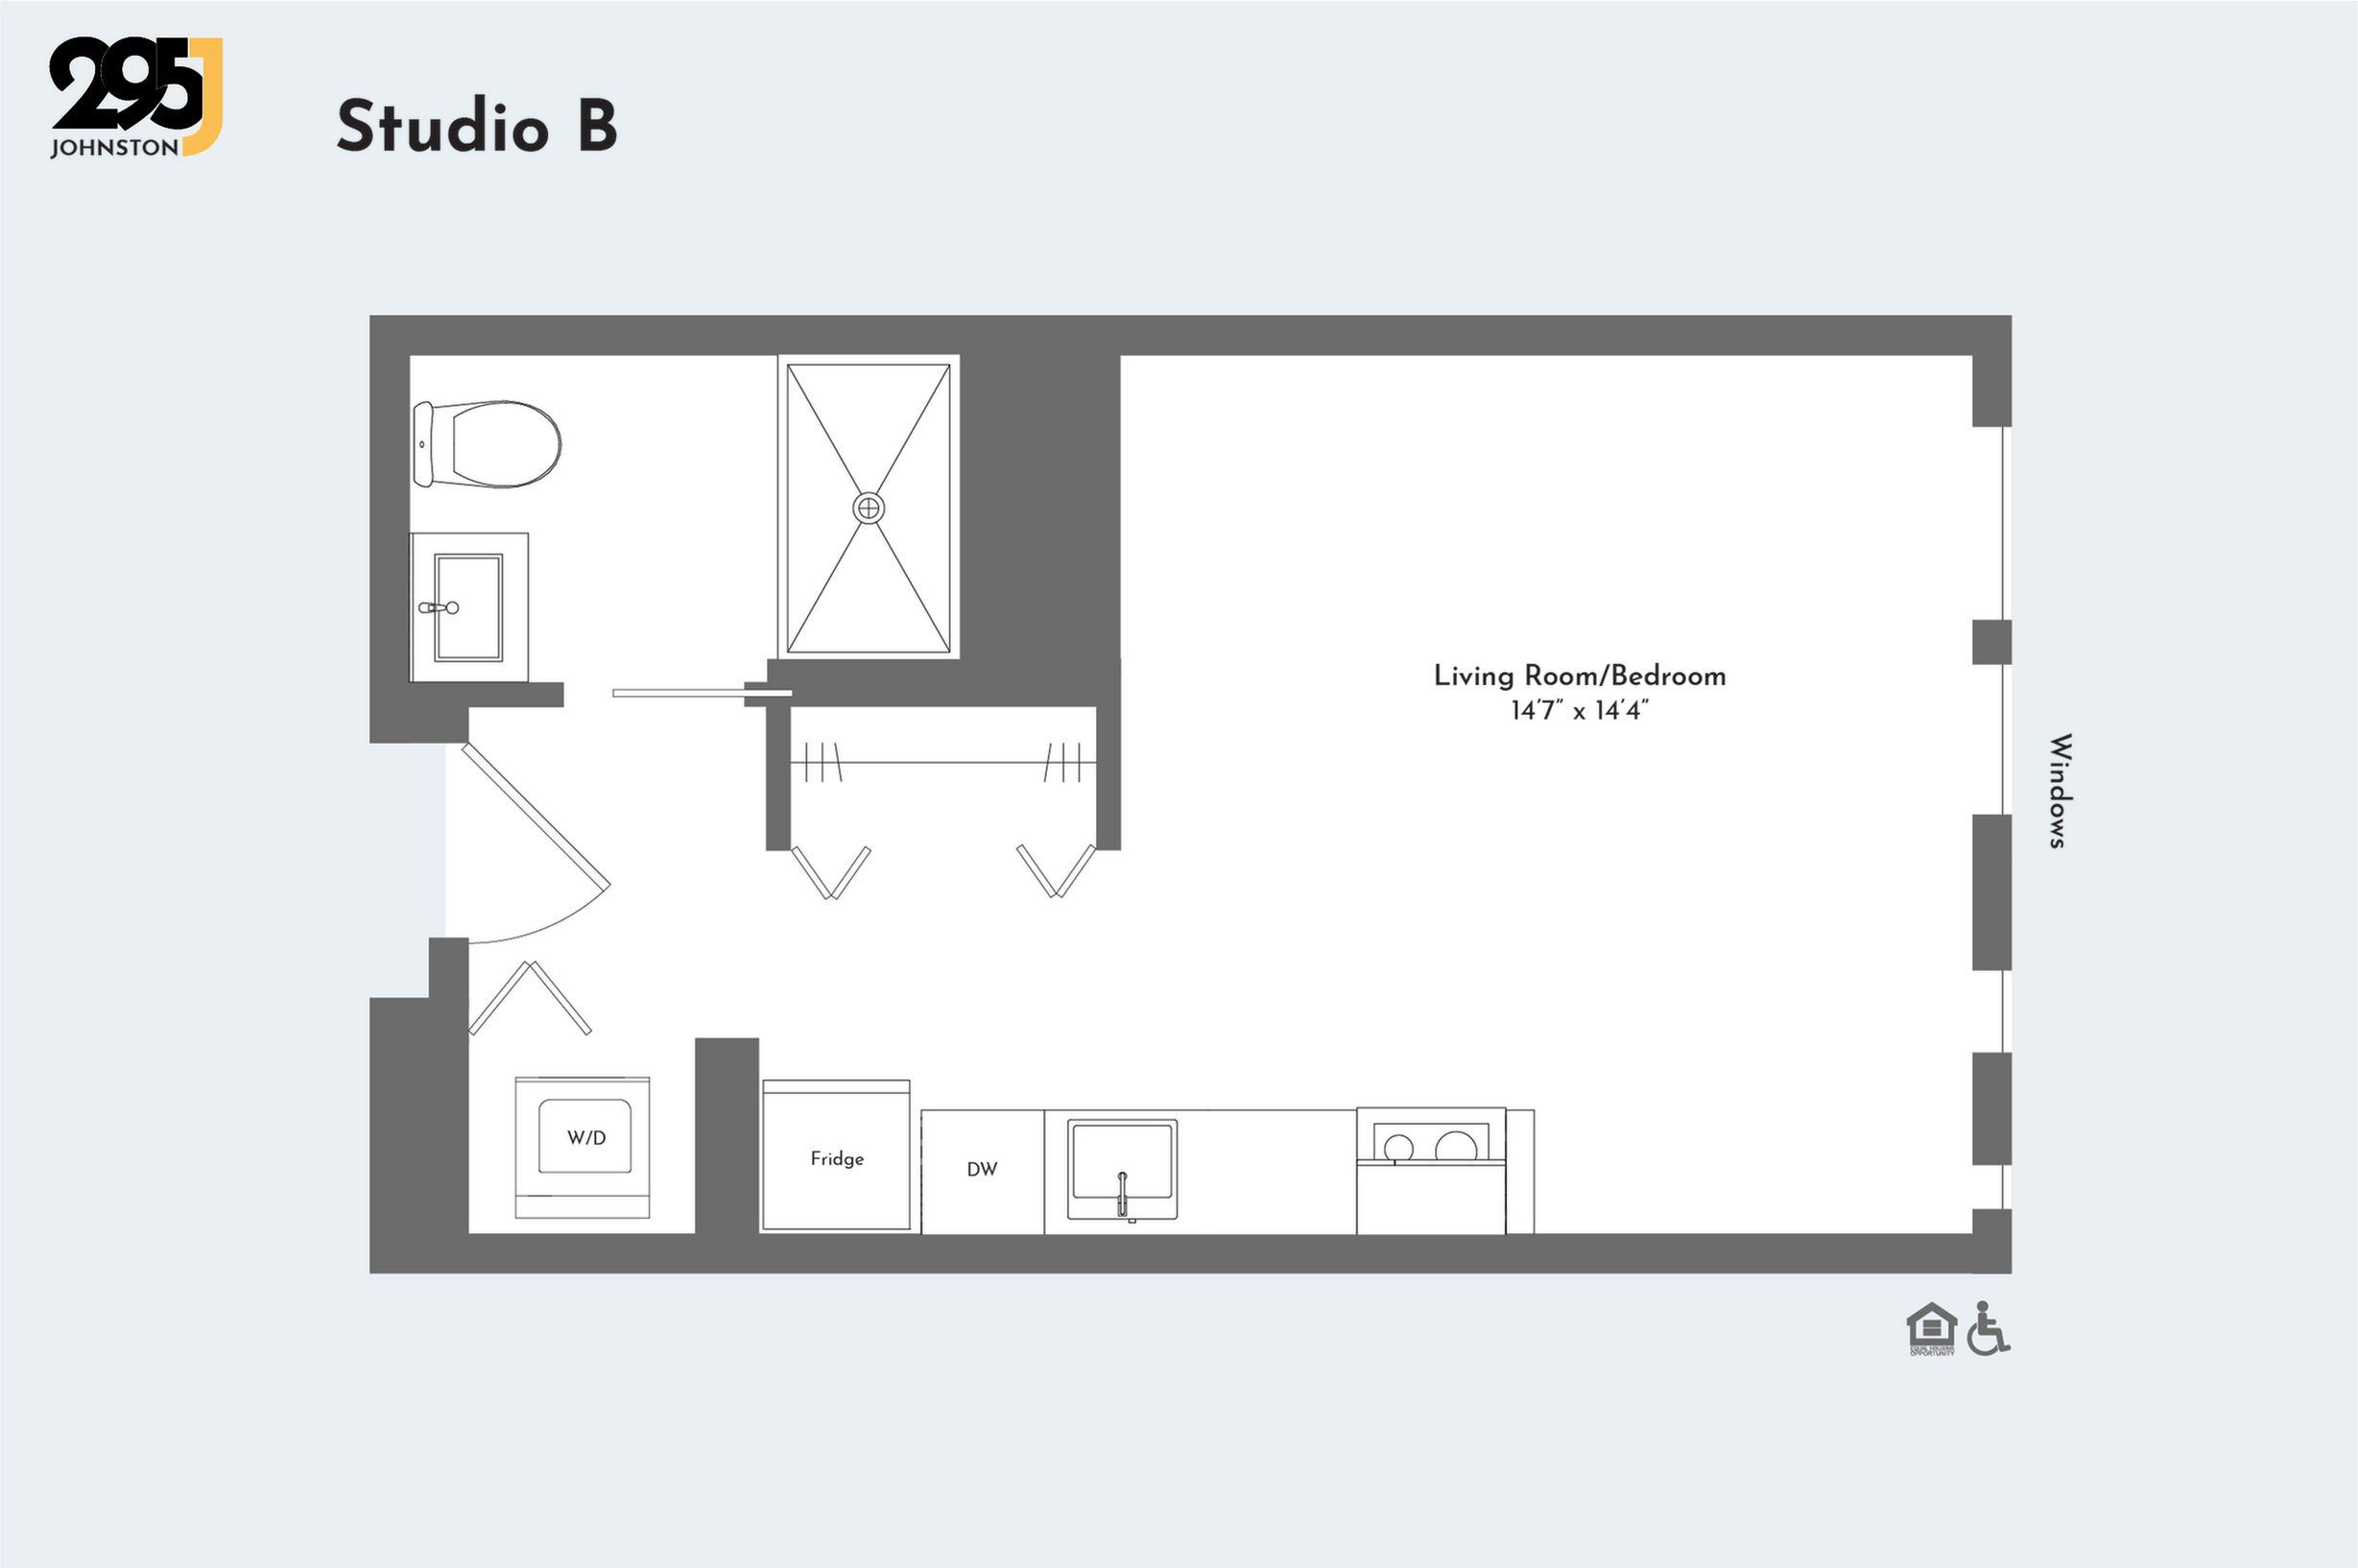 Studio B floorplan